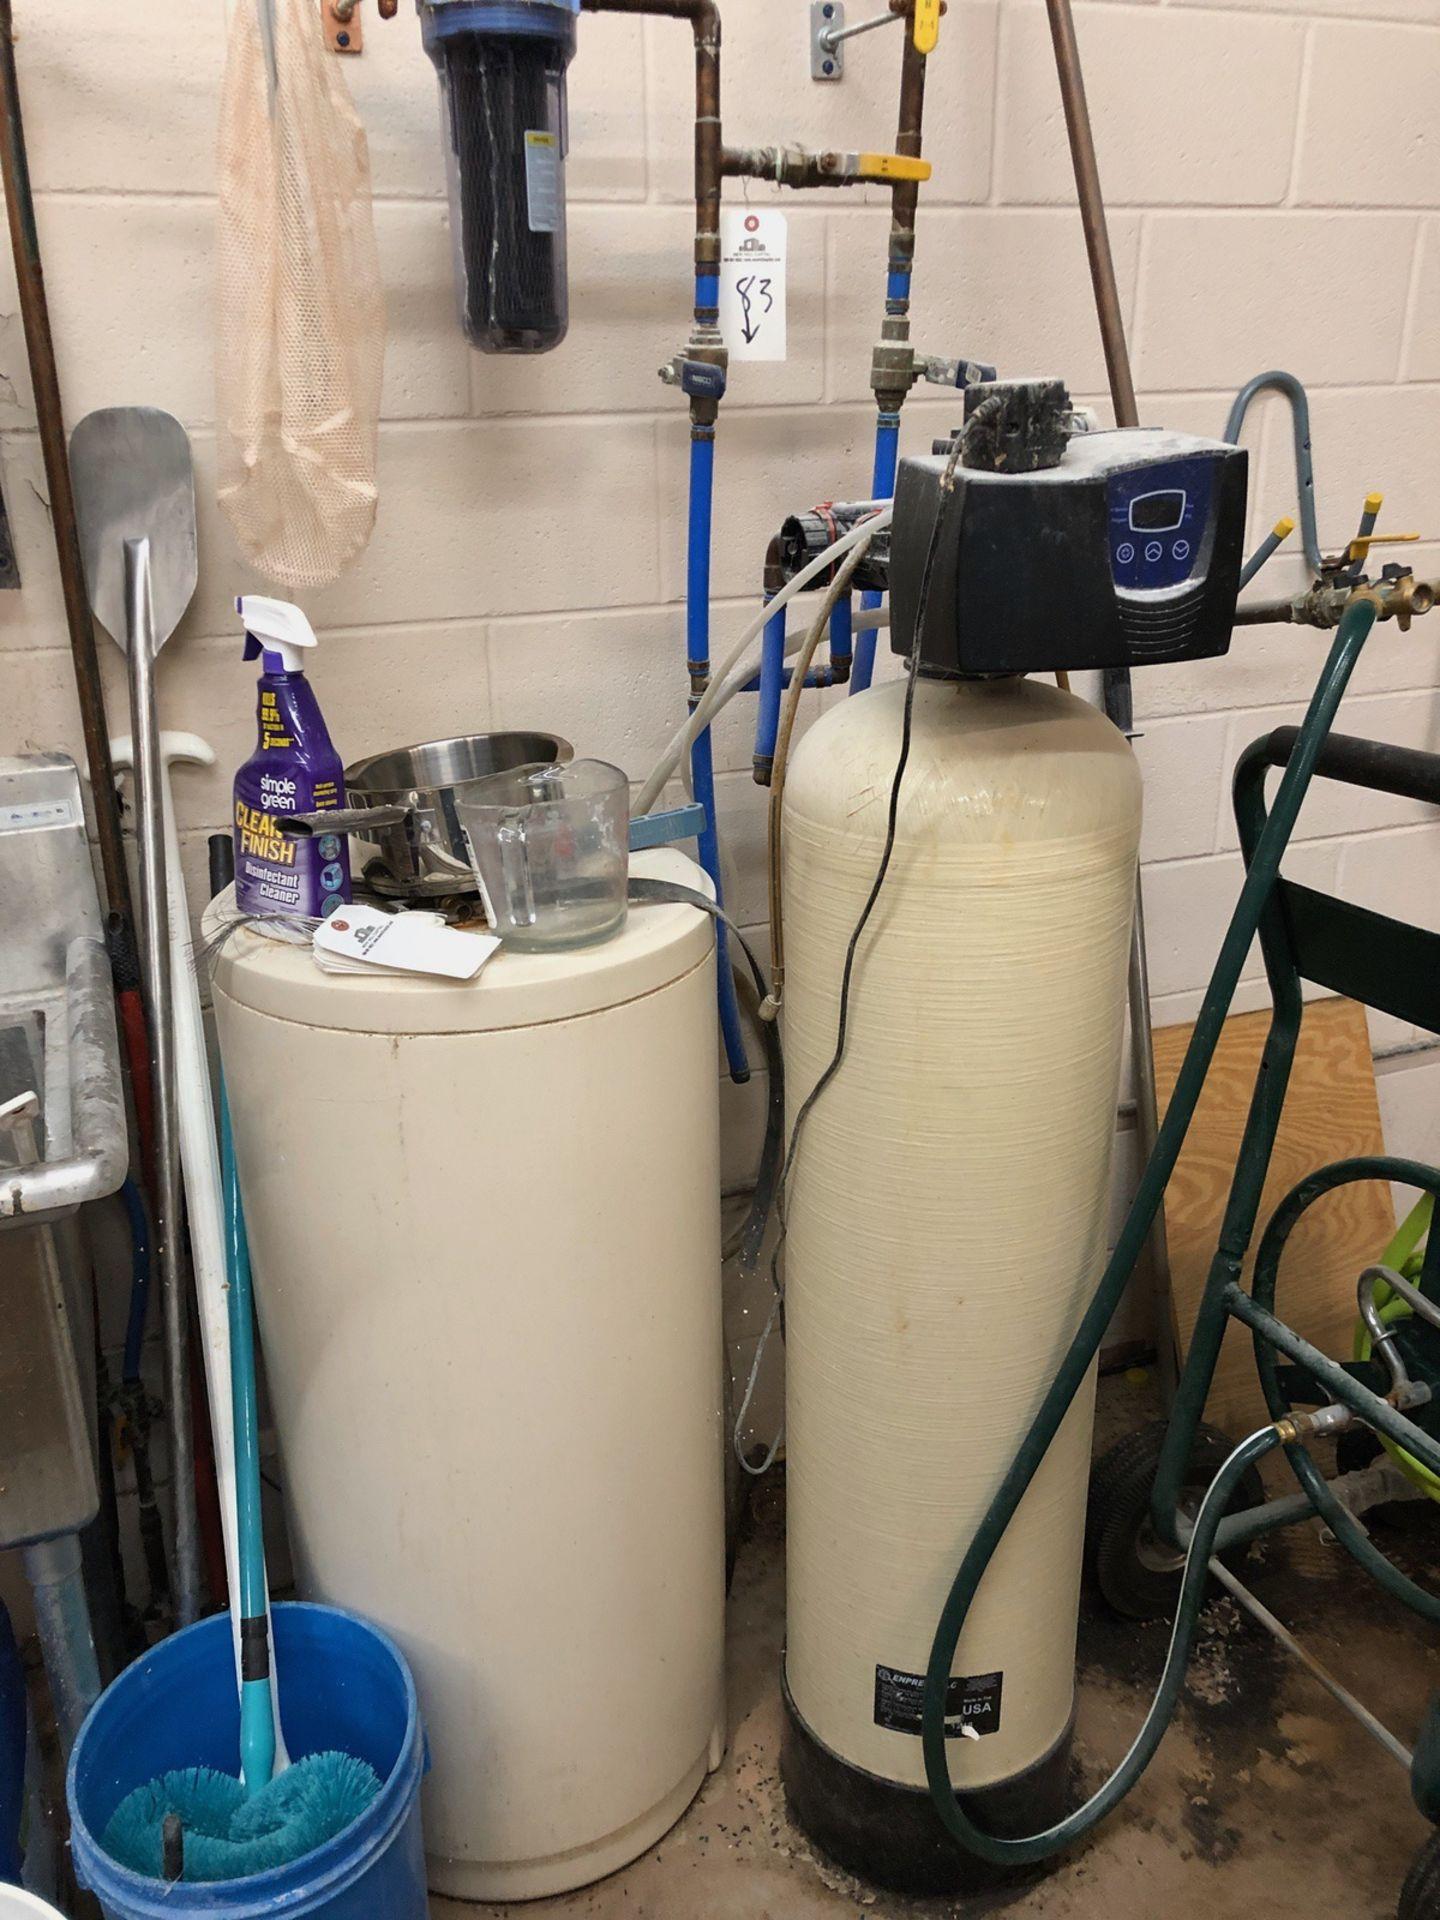 Lot 83 - Enpress Water Filtration System | Rig Fee: $100